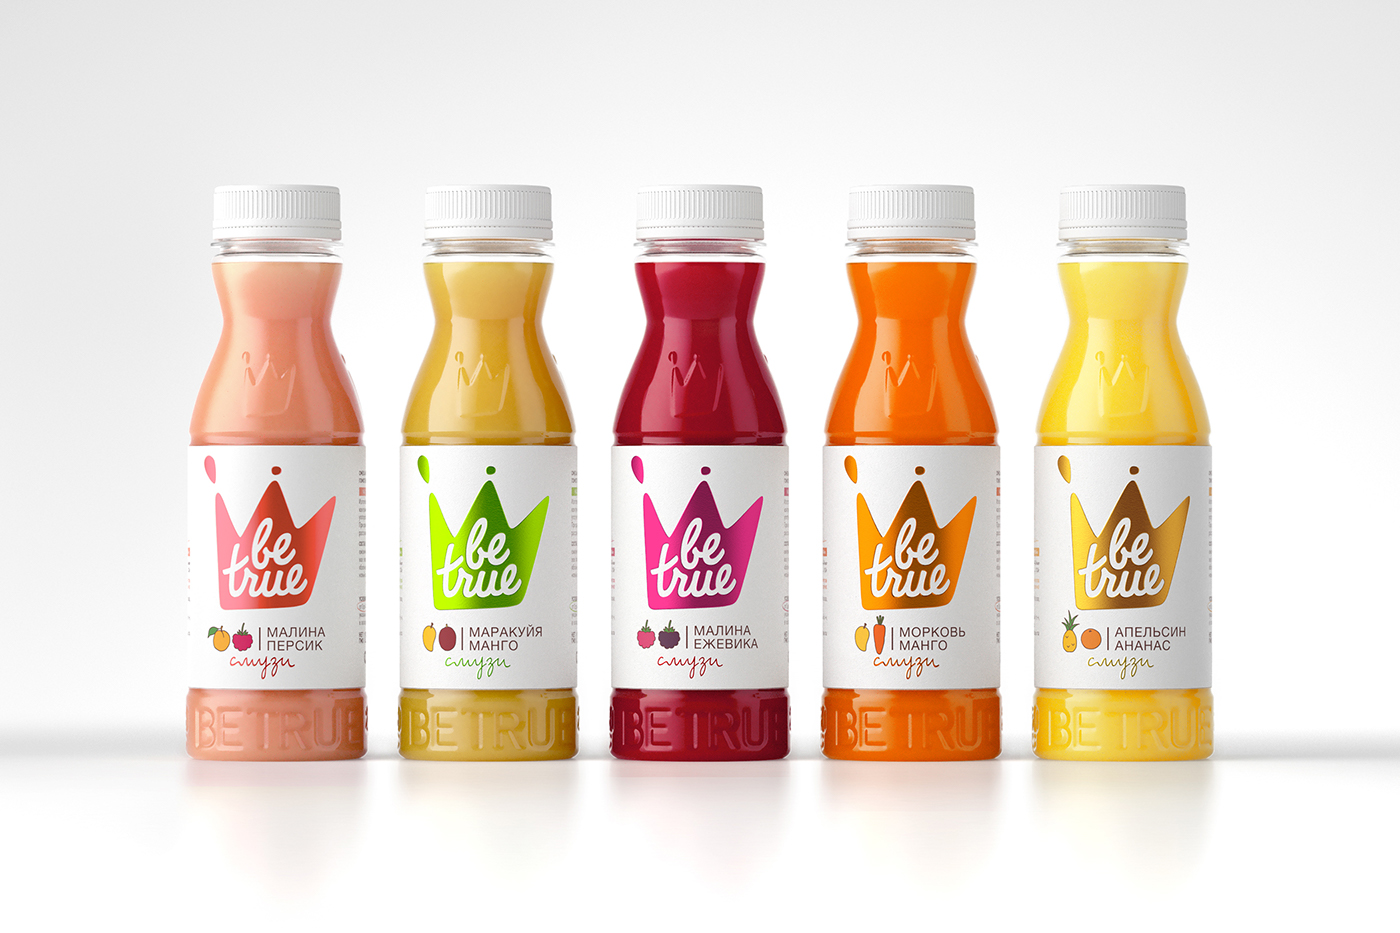 bottle crown smoothie logo Food  Fruit juice be true pentawards Pack